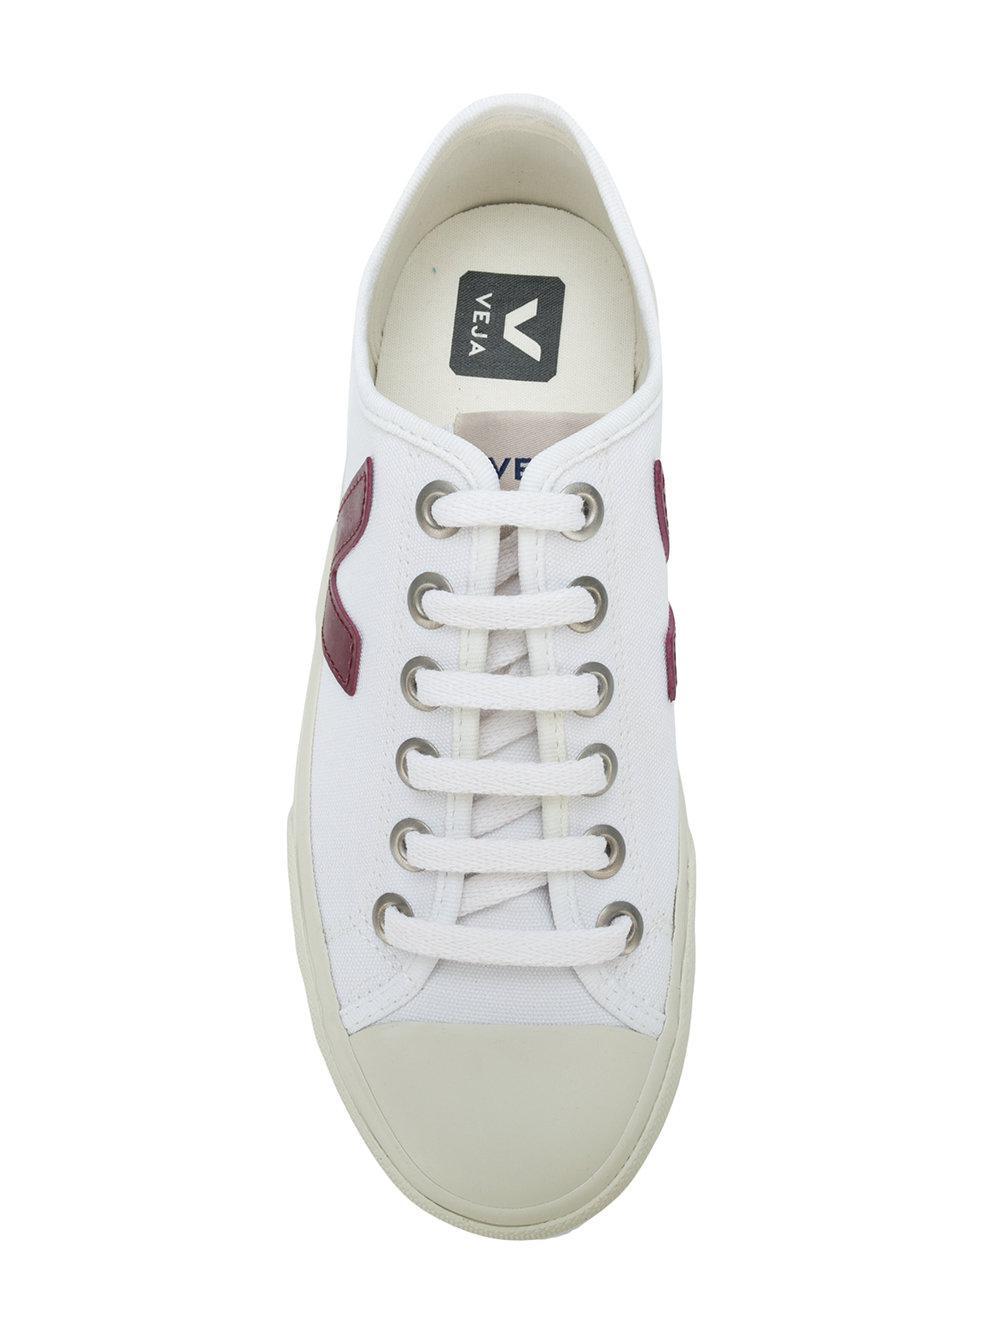 Veja Cotton Wata Sneakers in White